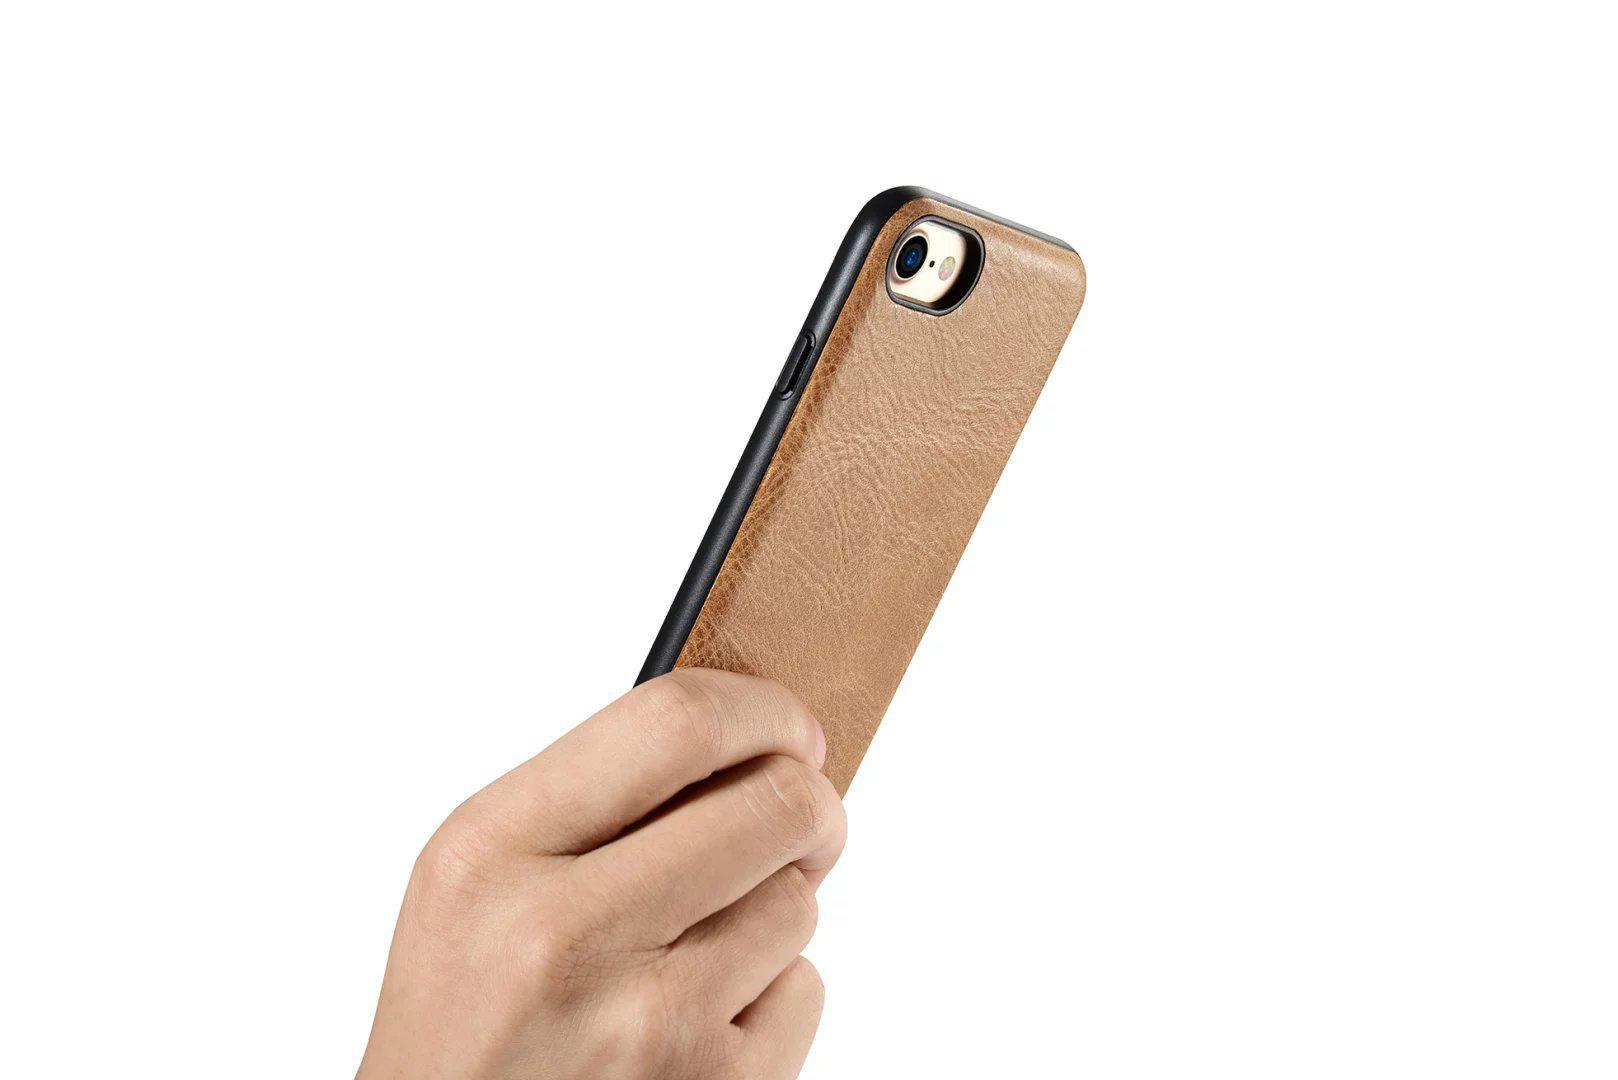 iCarer iPhone 7 Shenzhou Genuine Leather Fashional Back Cover Case 15